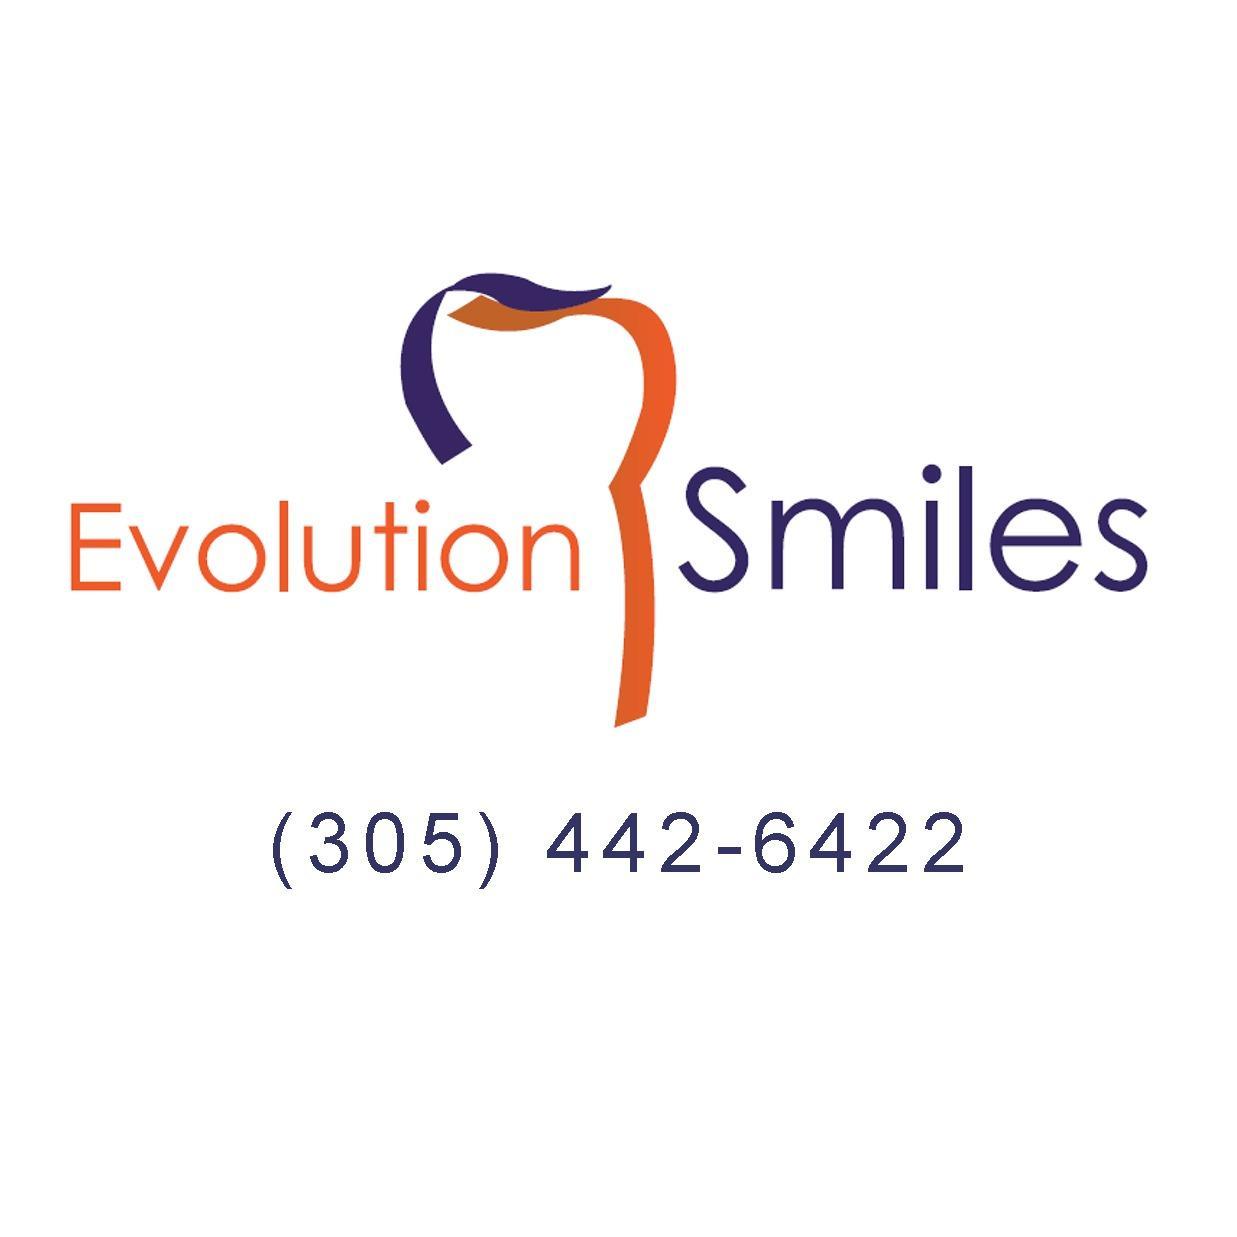 Evolution Smiles - Coral Gables